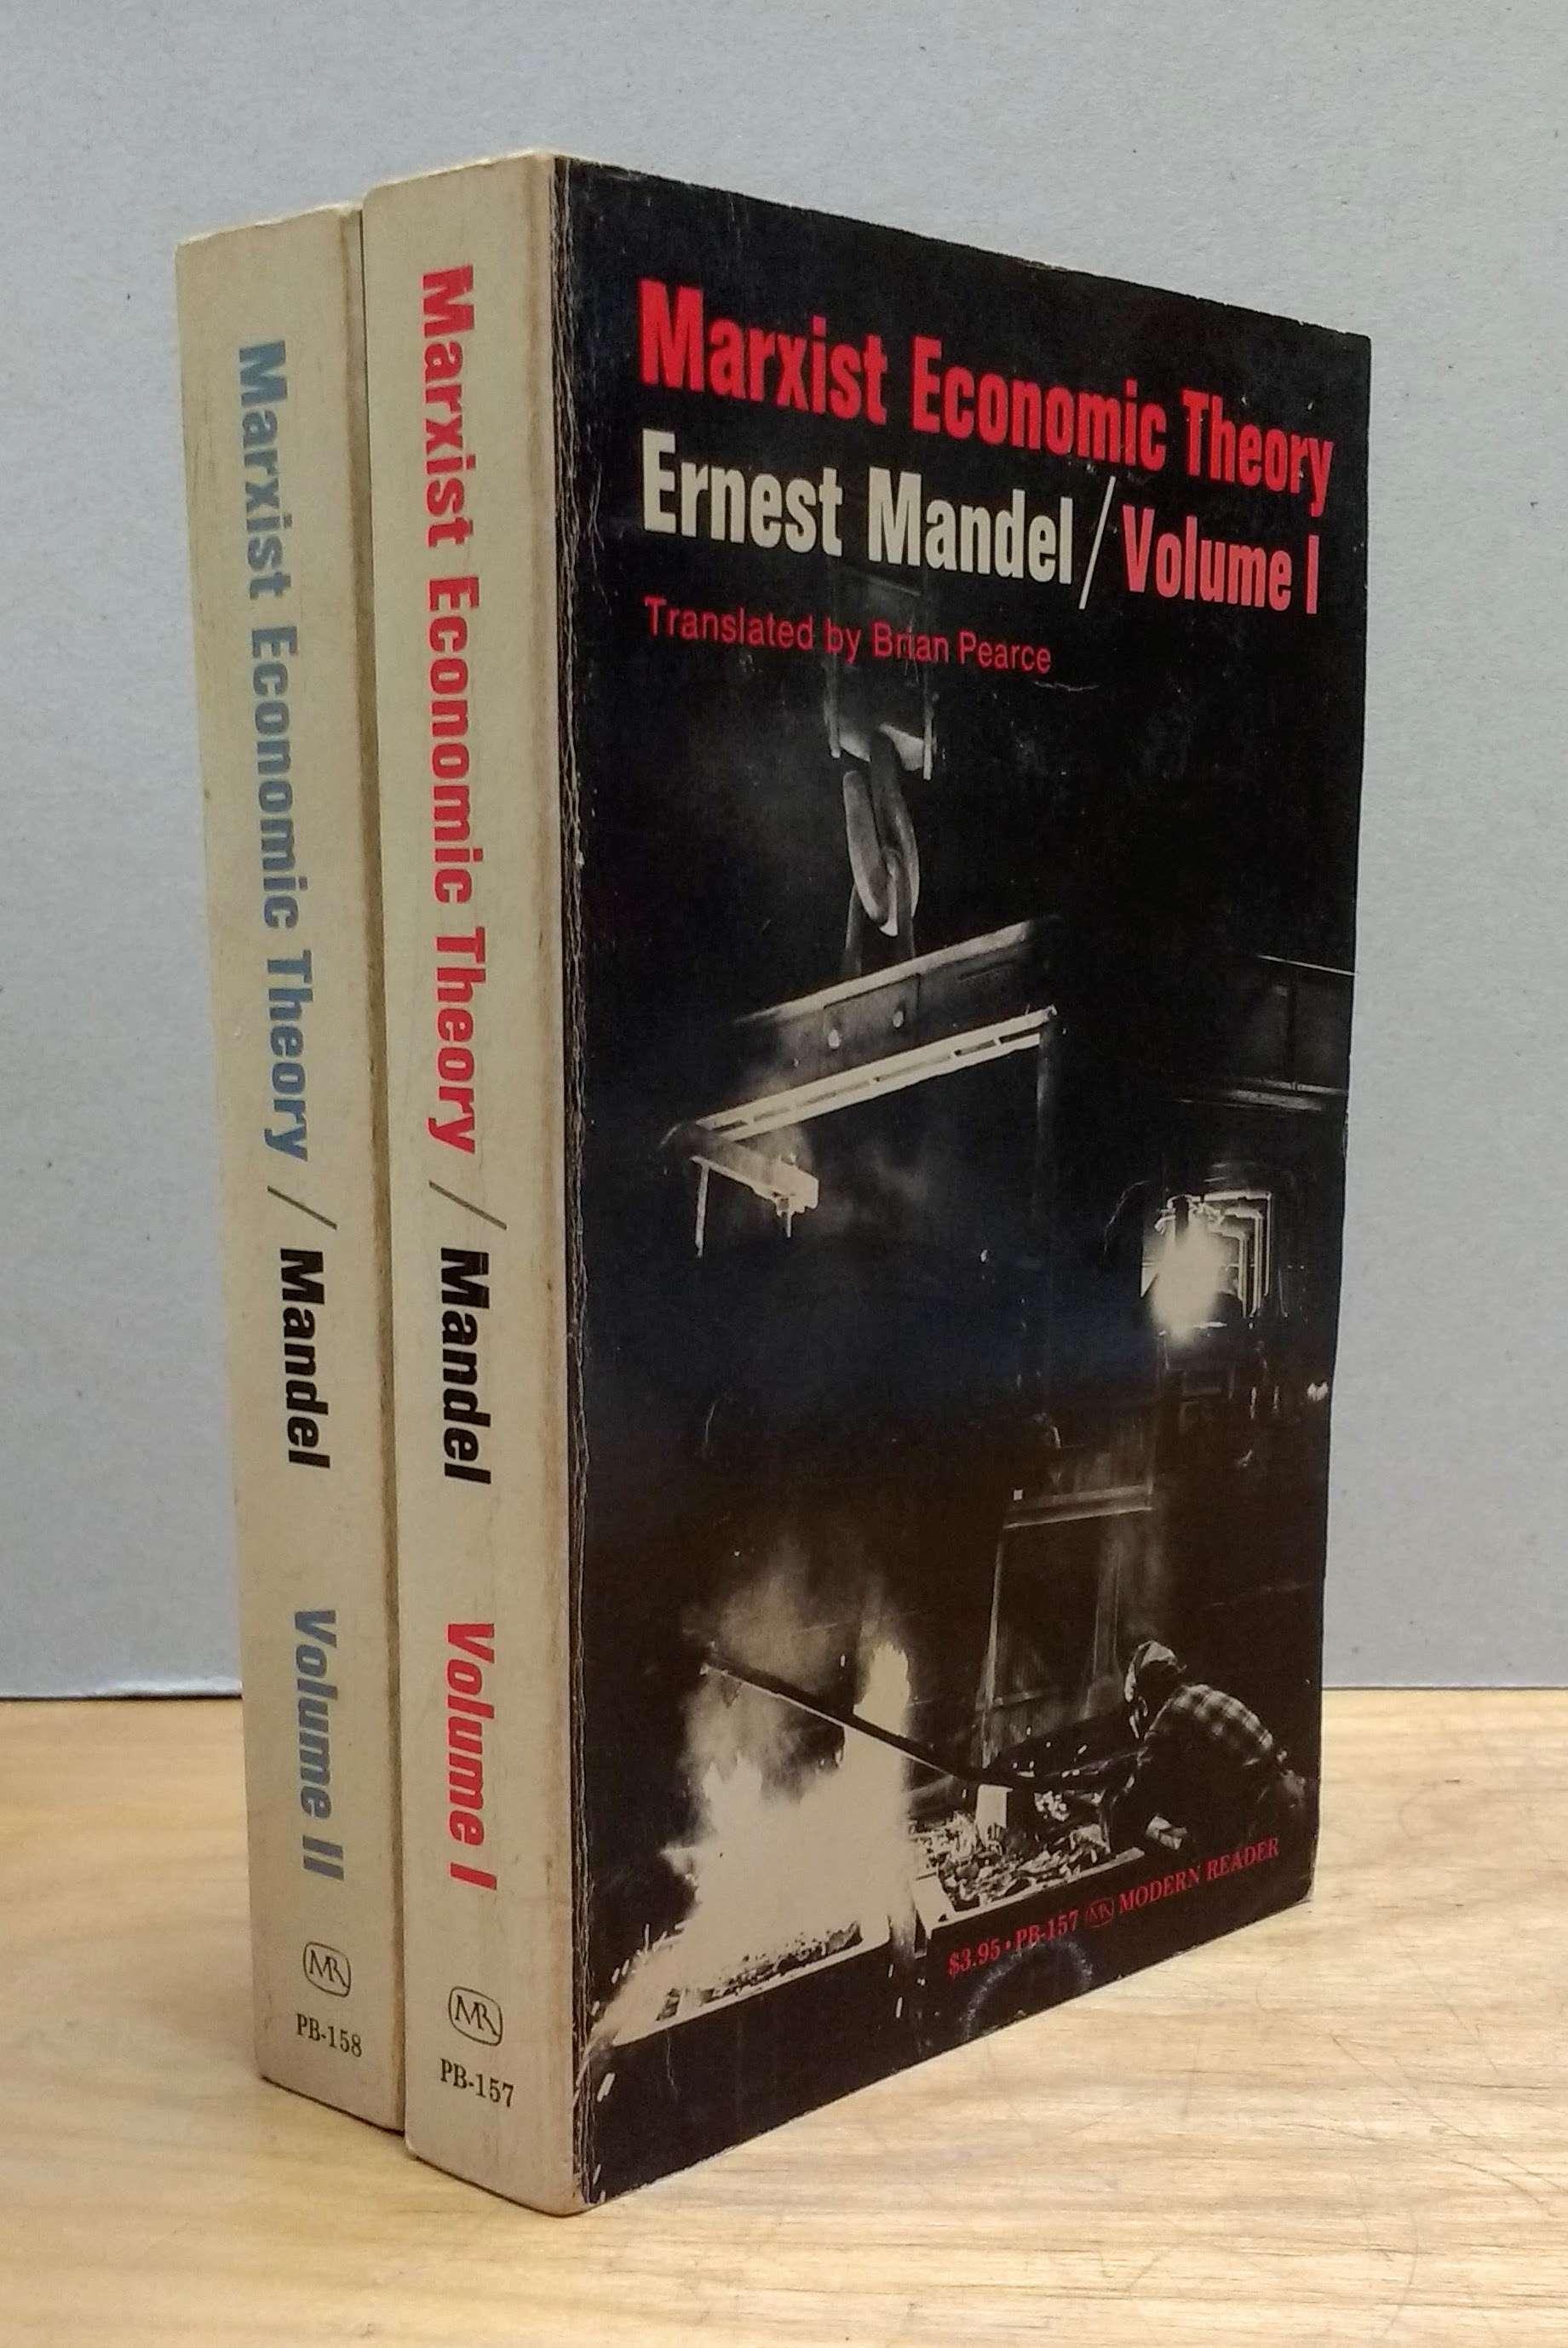 Marxist Economic Theory. Two Volume Set, 2 Volumes., Mandel, Ernest